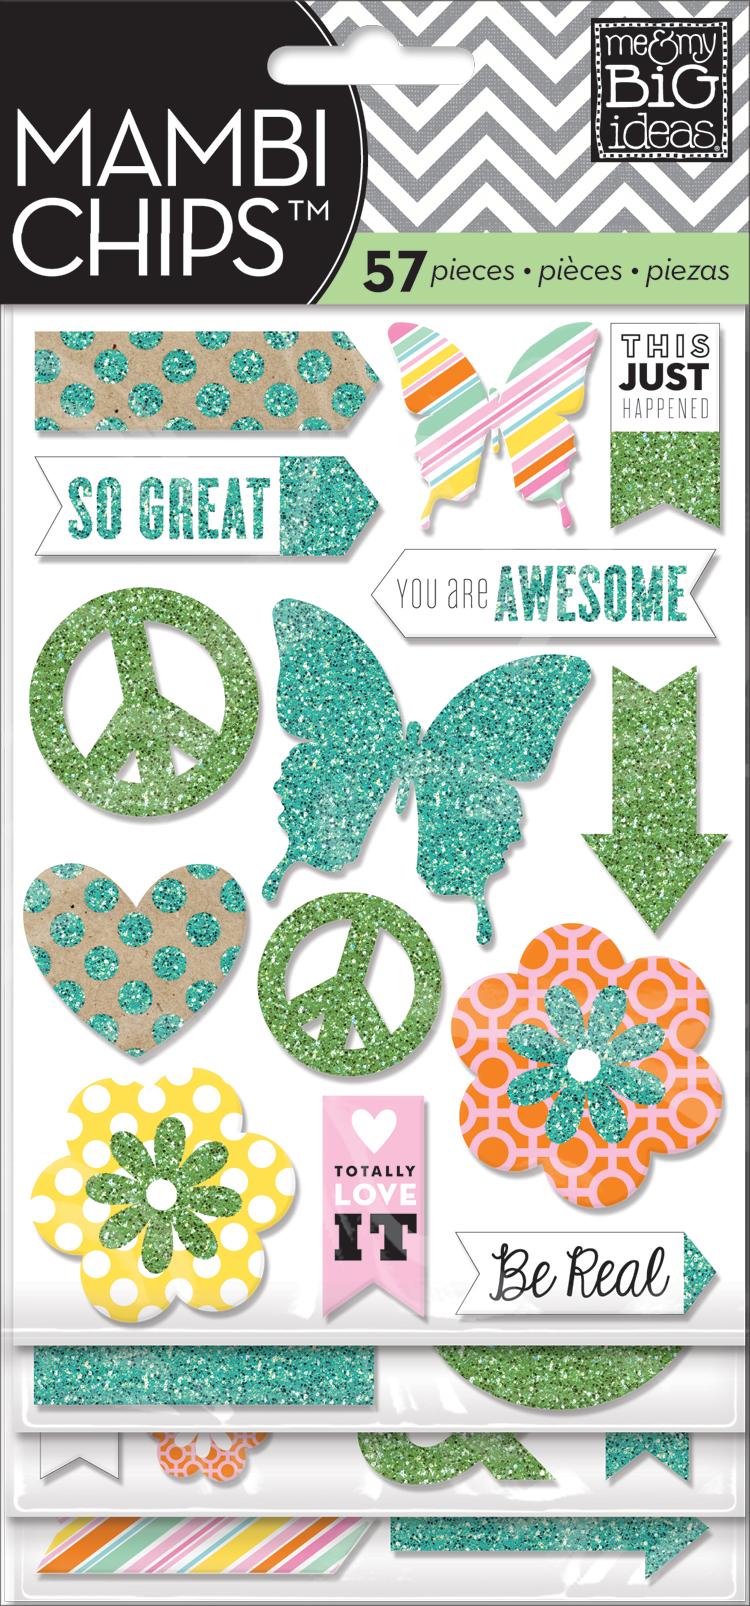 mambiCHIPS: teal & green glitter chipboard scrapbooking embellishments.